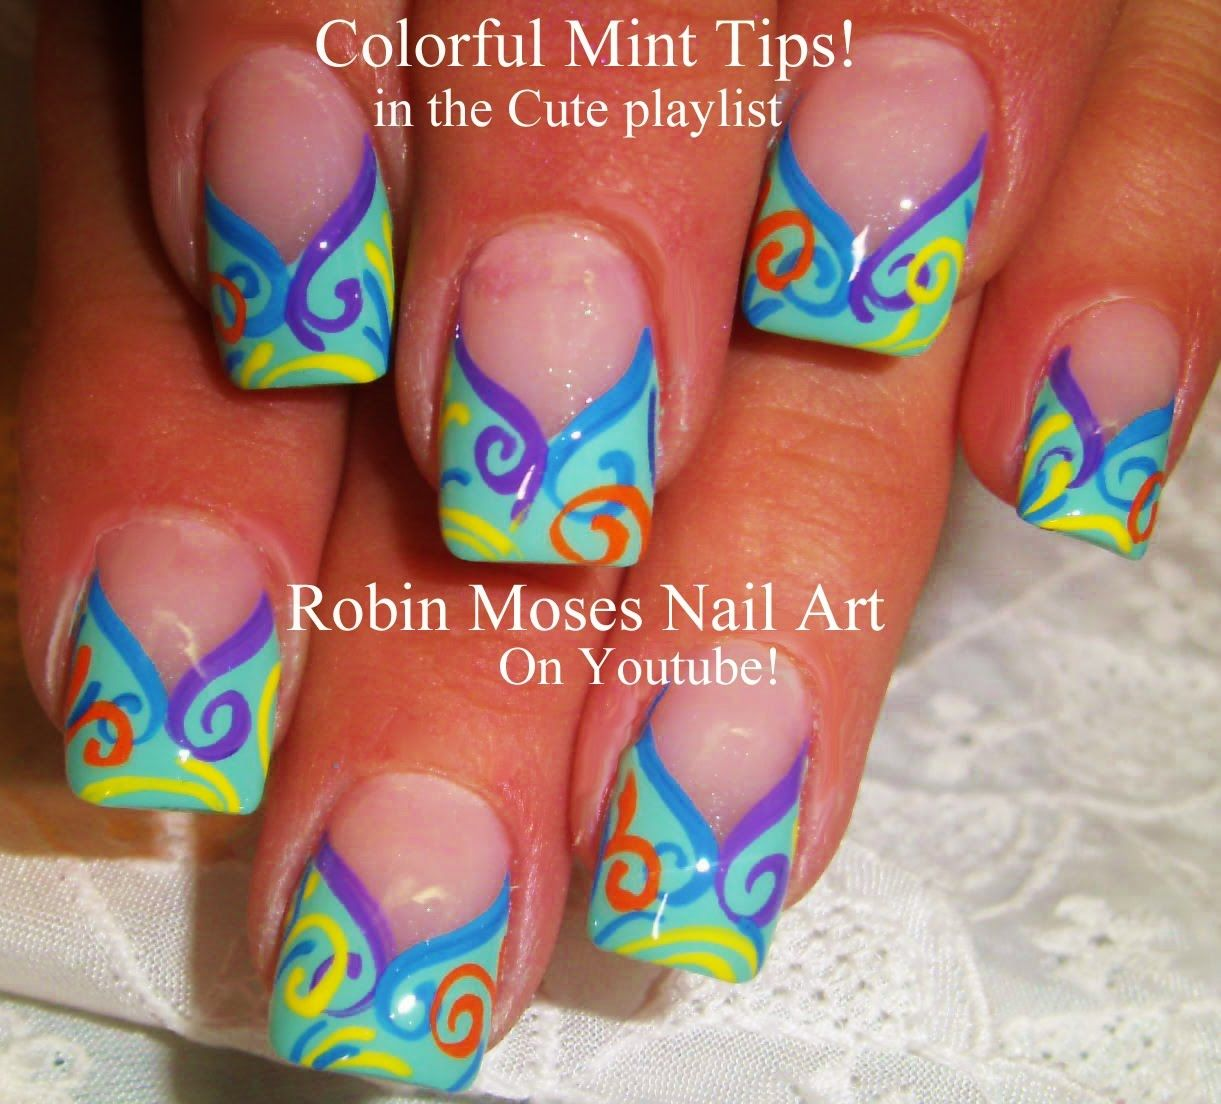 Nail Art Tutorial - Mint Tip nails designs with a Twist